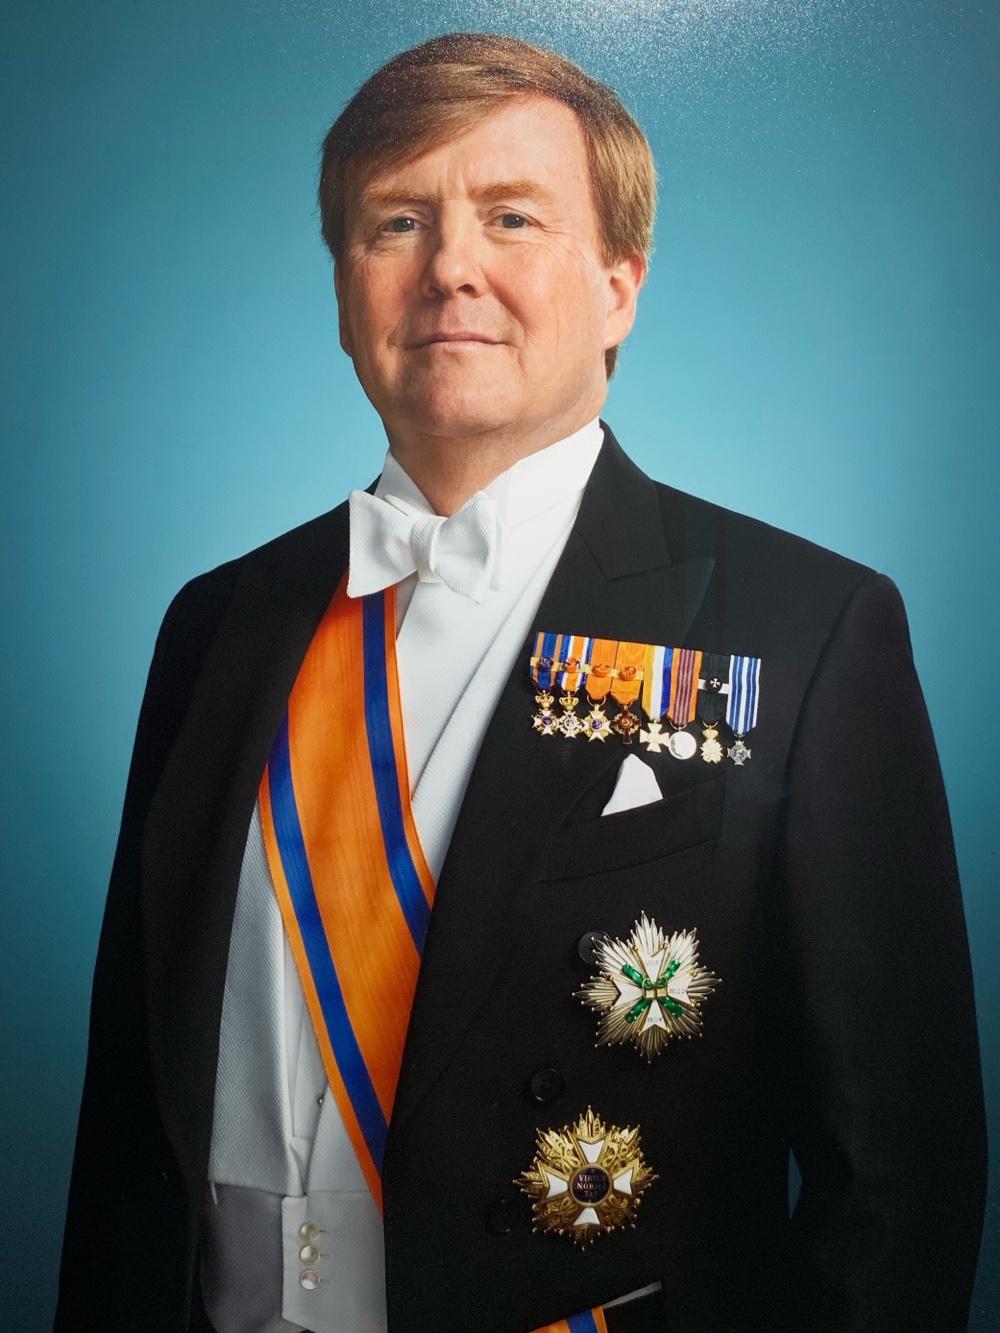 Willem Alexander van Erwin Olaf